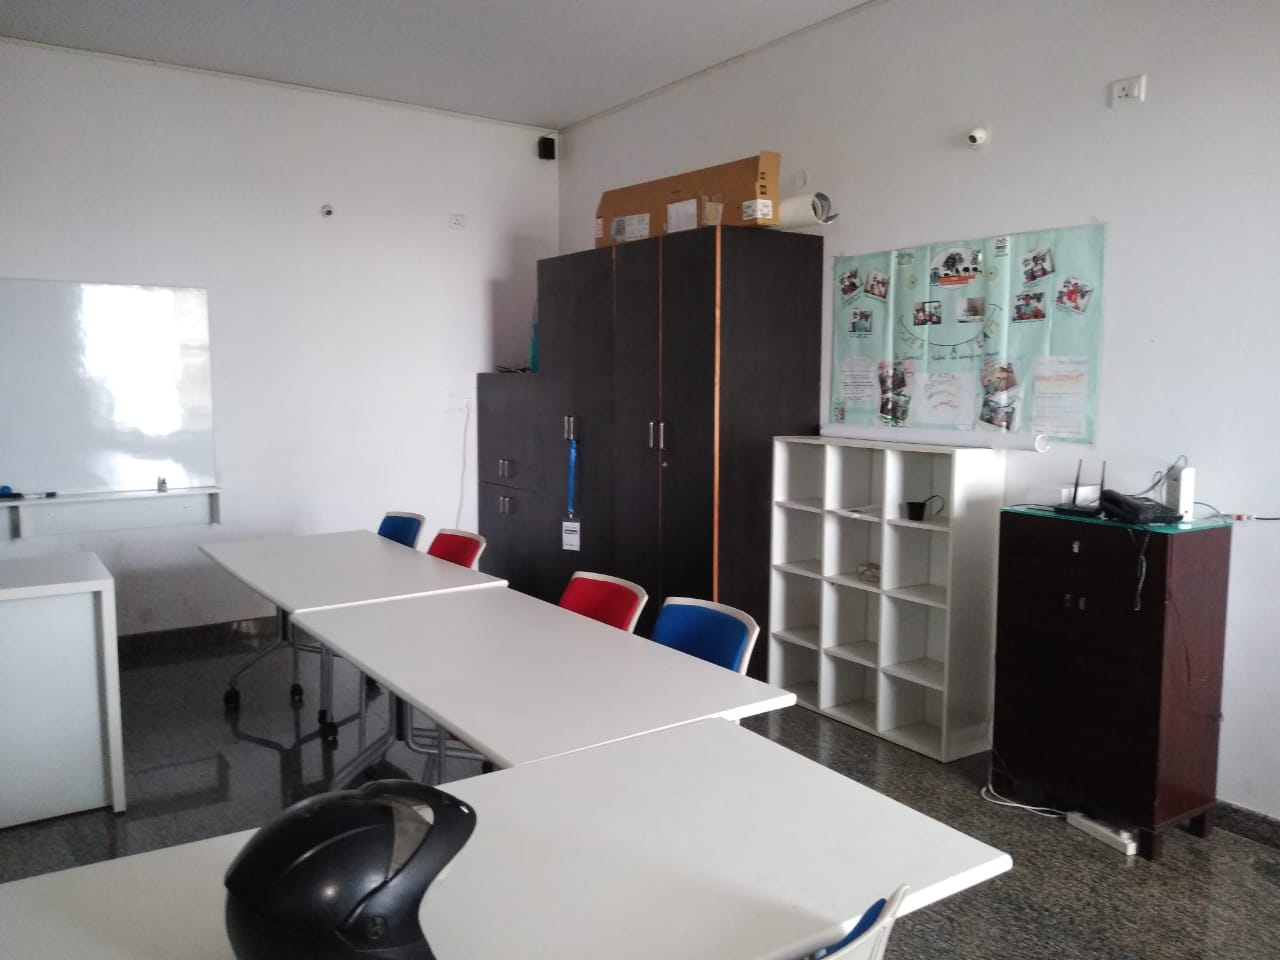 Stem Learning, Robotics, Electronics Training Institute for Sale in Bangalore